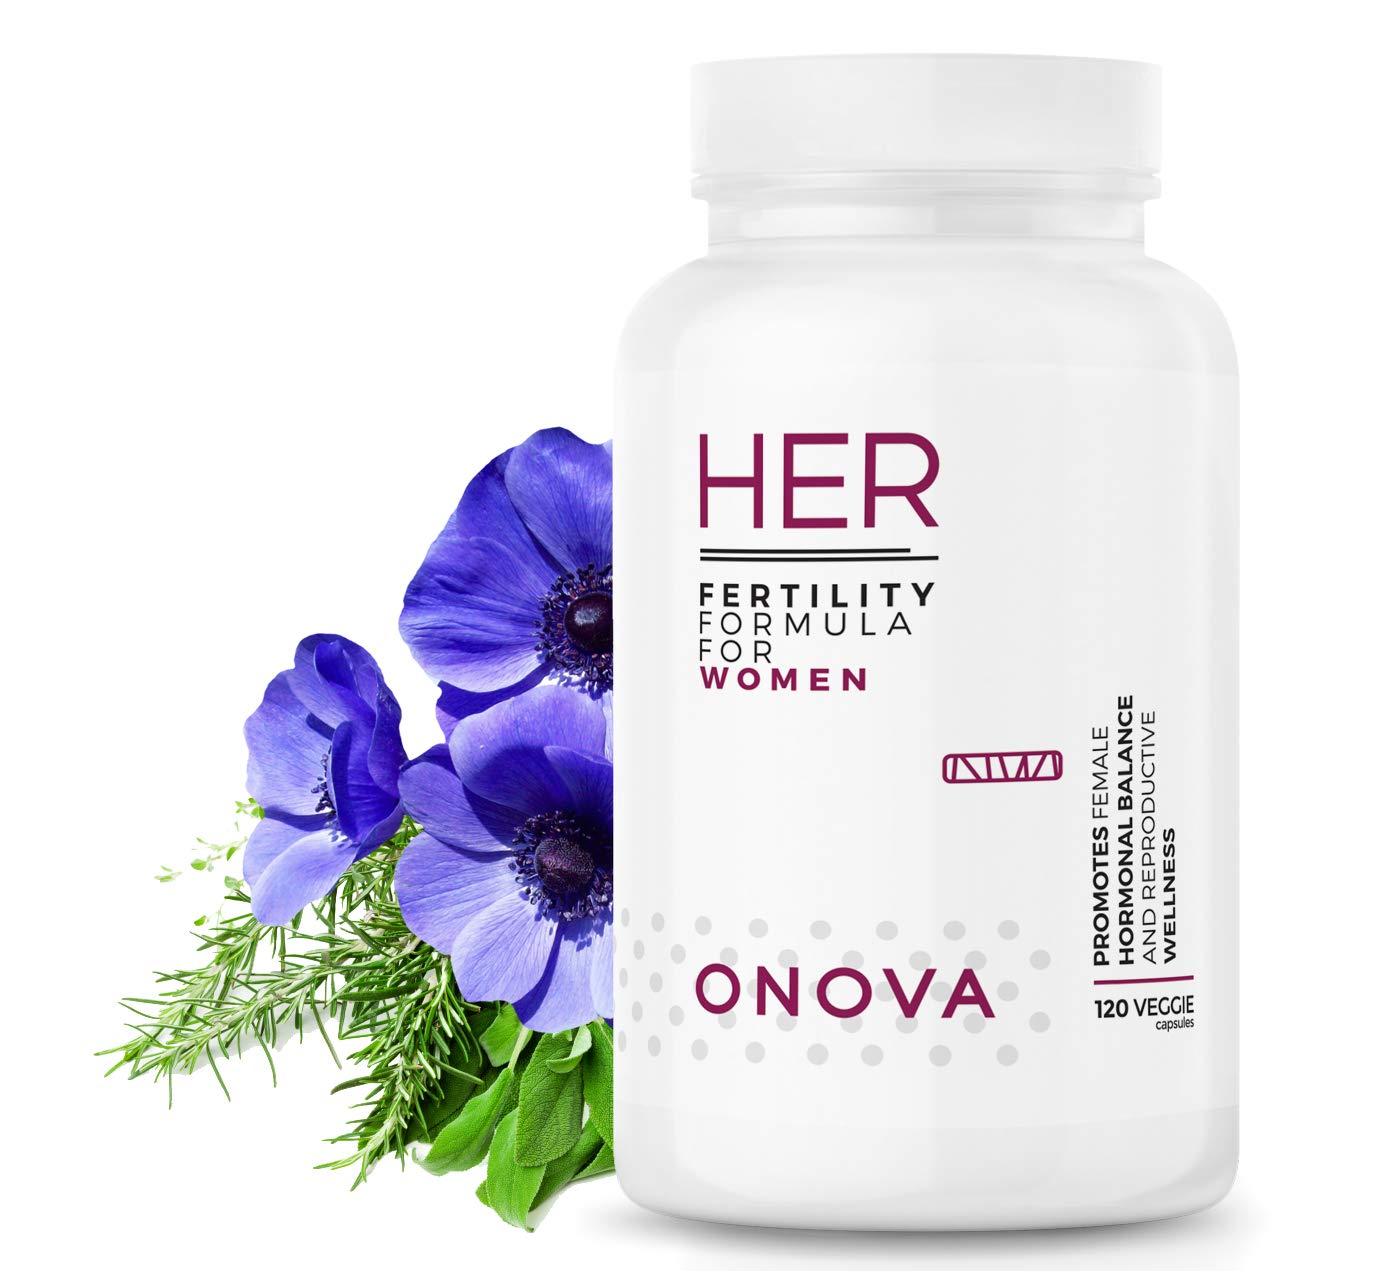 ONOVA Prenatal Fertility Supplement - Regulate Your Cycle, Balance Hormones, Improve Egg Quality, Aid Ovulation, 2000mg Blend of Myo-Inositol for PCOS, Folic Acid, Vitex, CoQ10